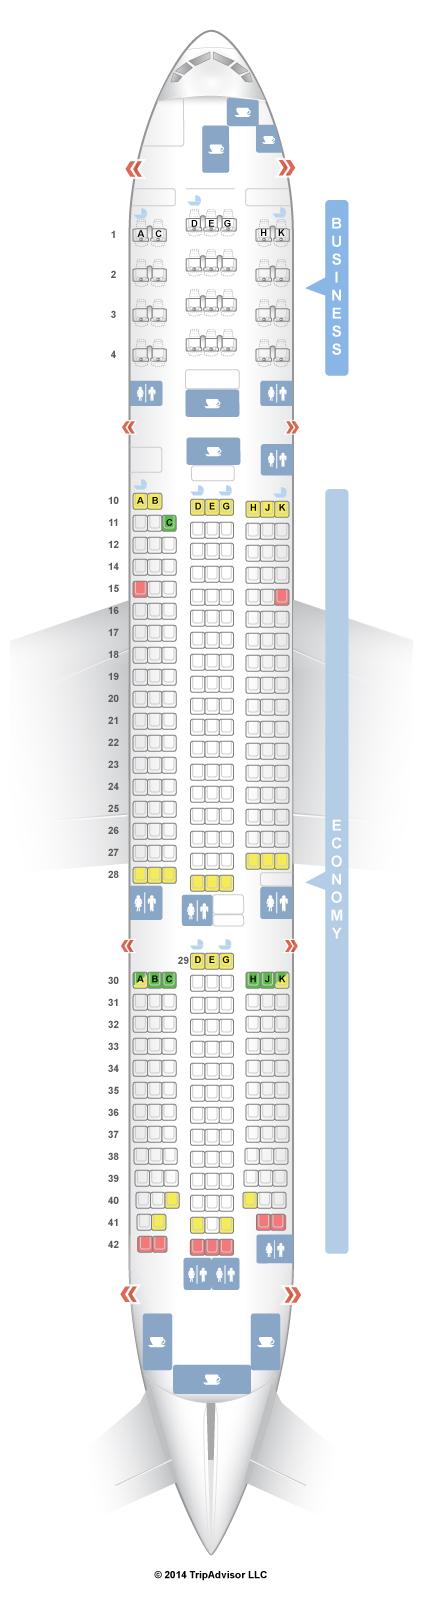 SeatGuru Seat Map Asiana Boeing 777-200ER (772) V2